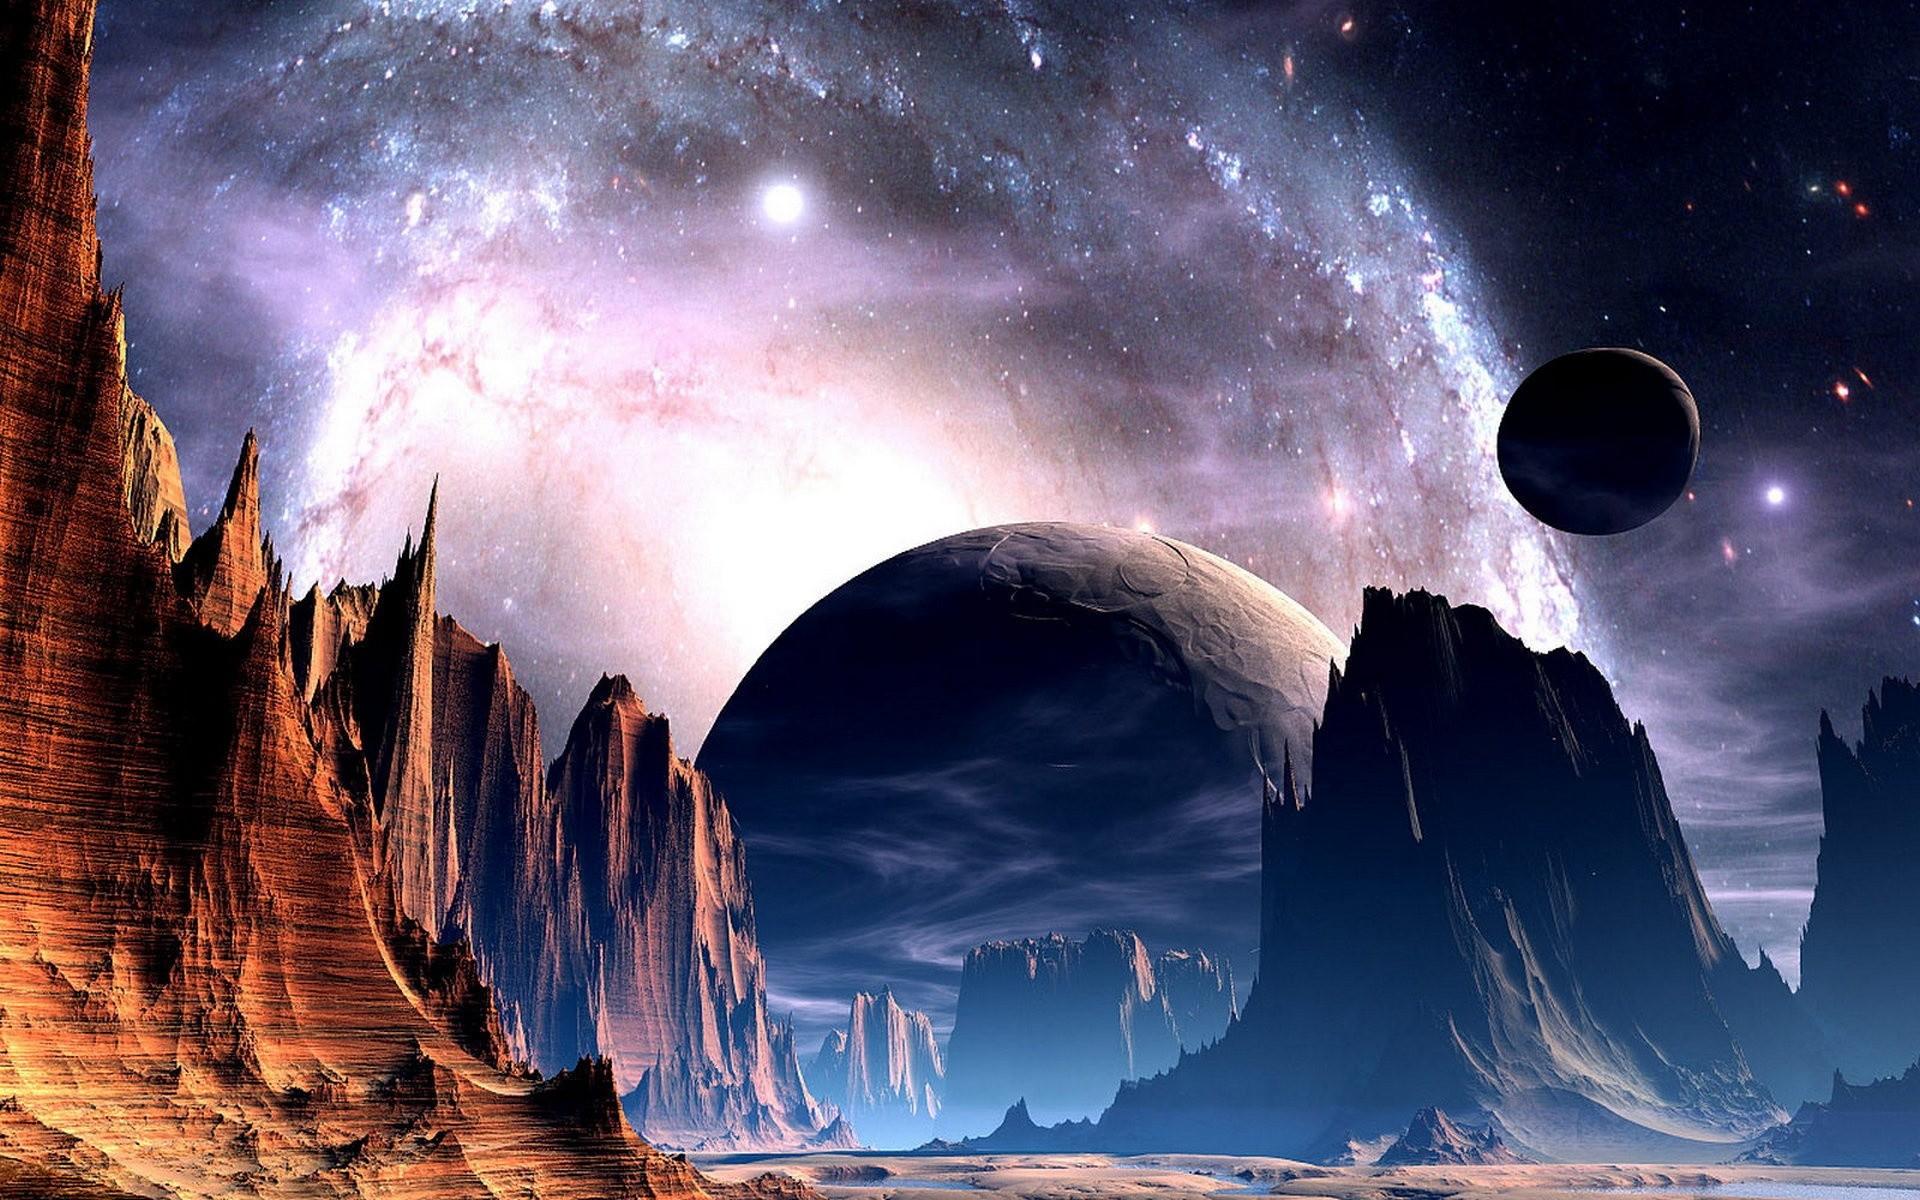 Explore Sci Fi Wallpaper, Car Wallpapers, and more!